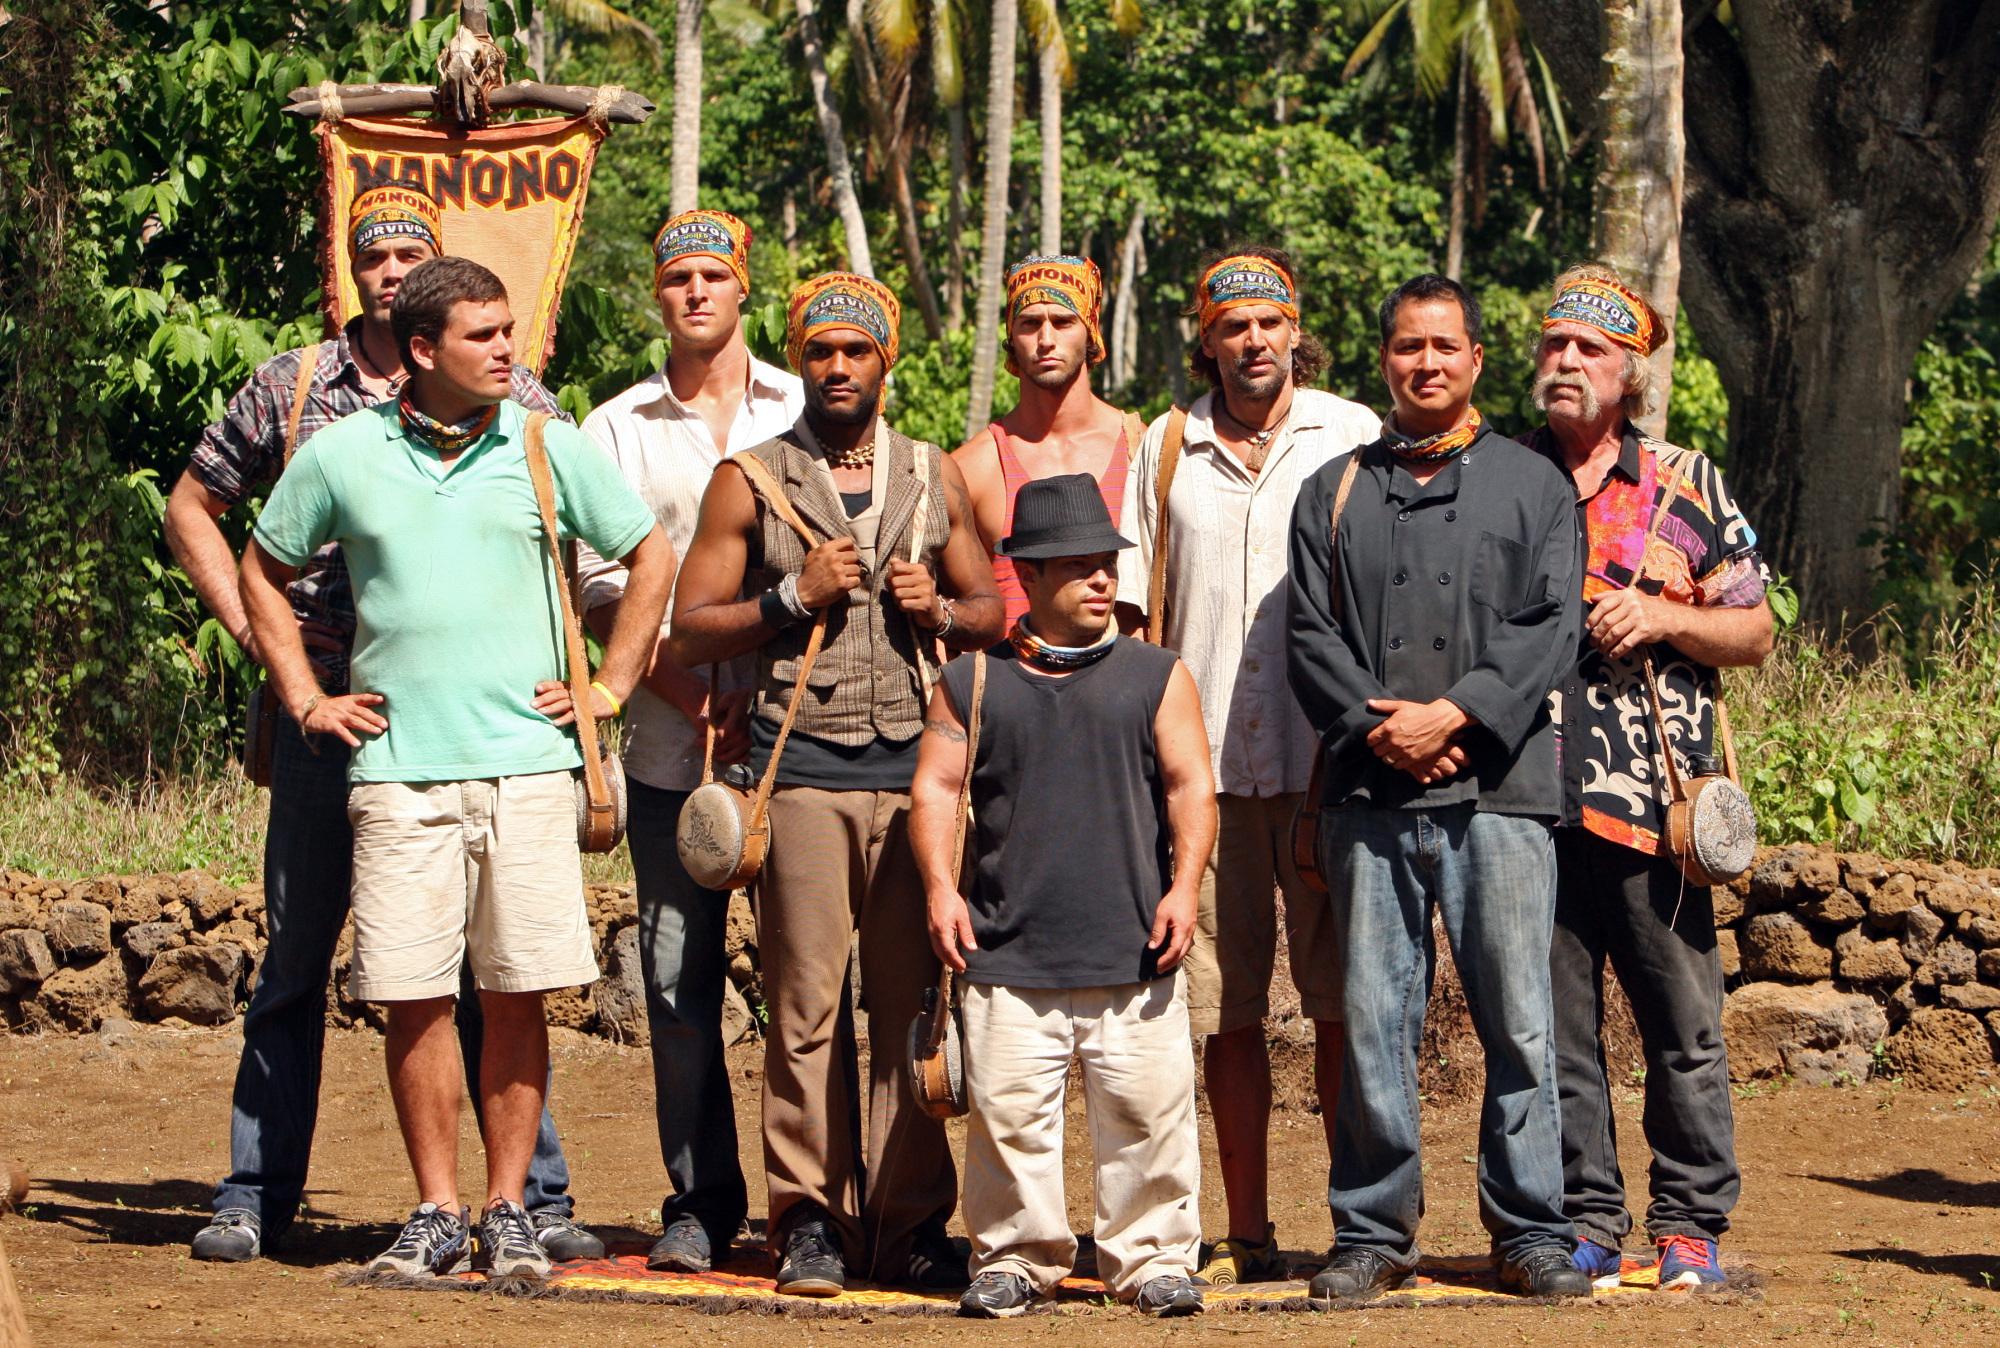 File:Manono tribe.JPG